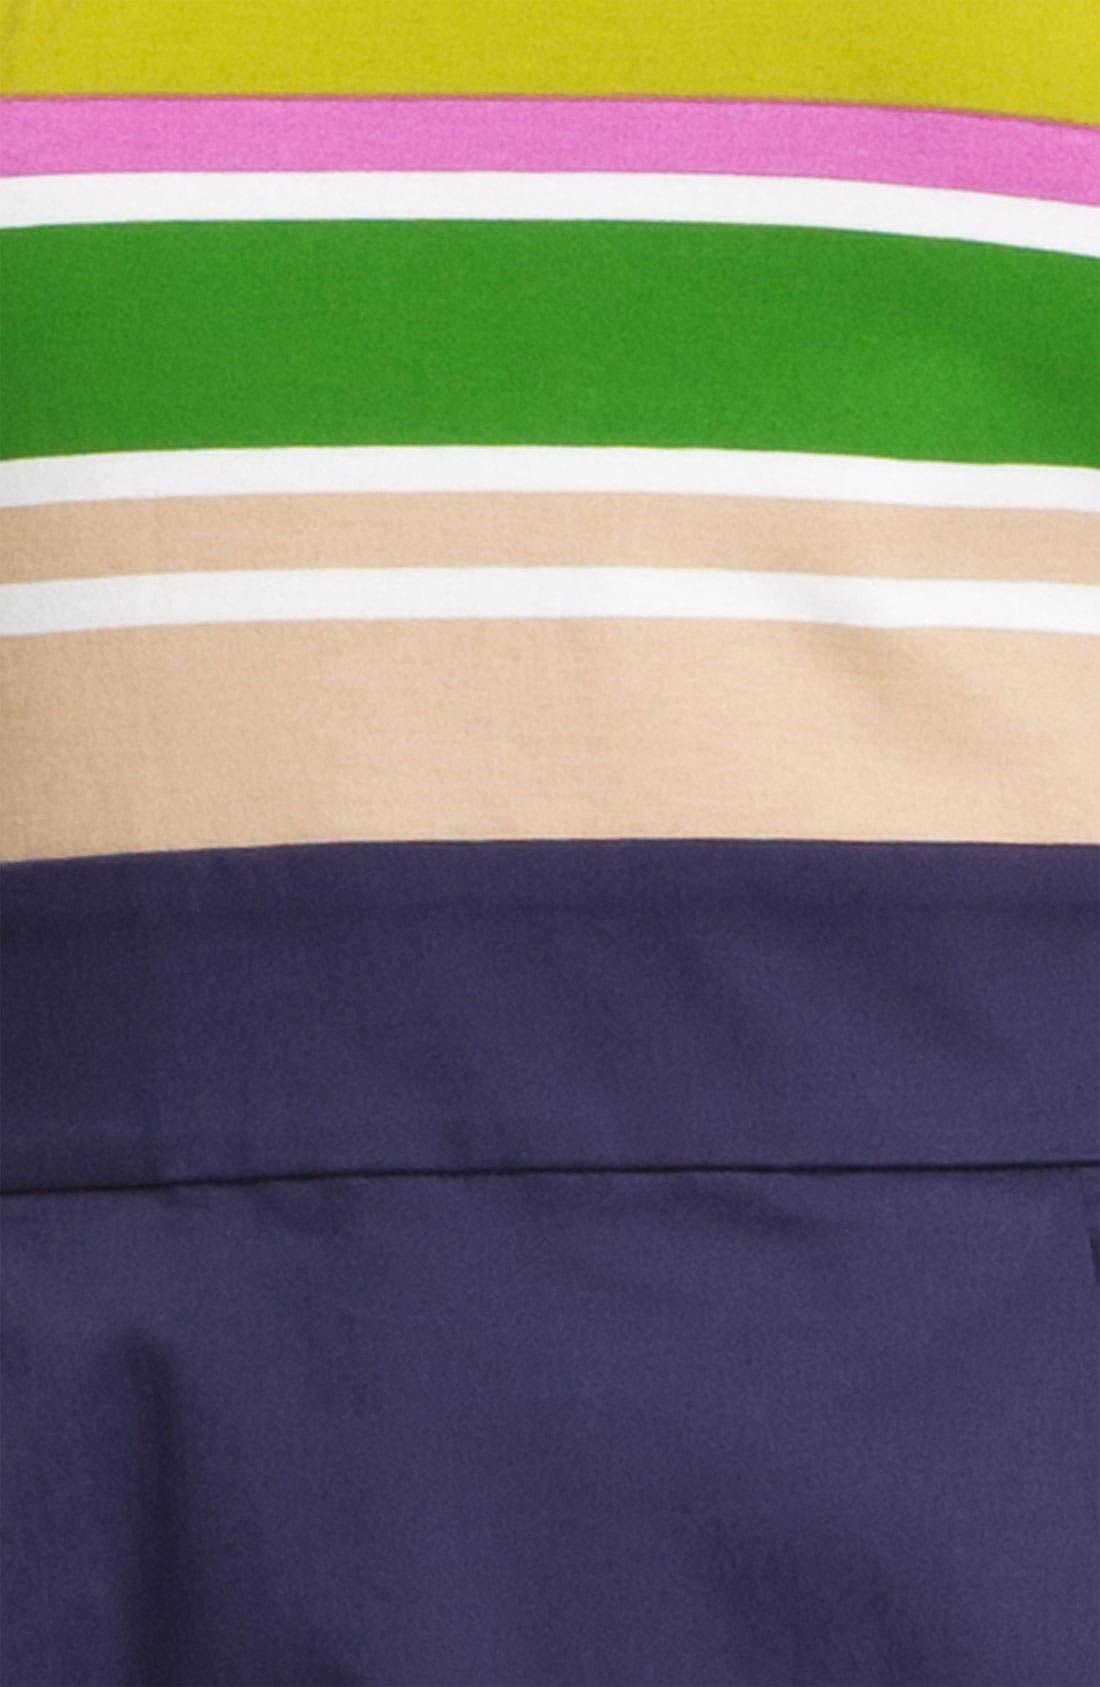 'jessica' stretch a-line dress,                             Alternate thumbnail 3, color,                             800